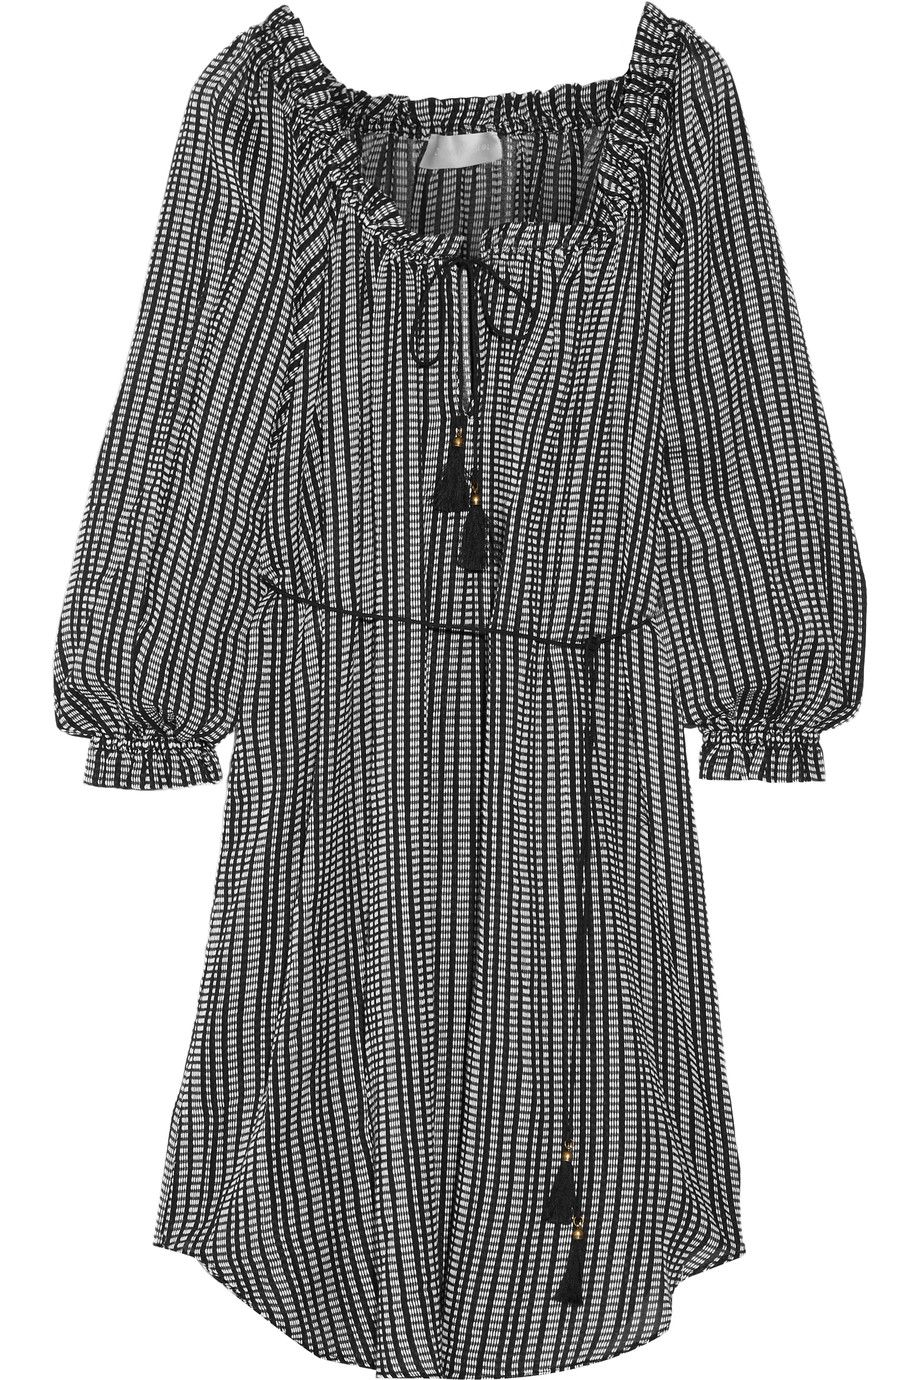 ZIMMERMANN Pavilion Striped Cotton-Gauze Dress. #zimmermann #cloth #dress